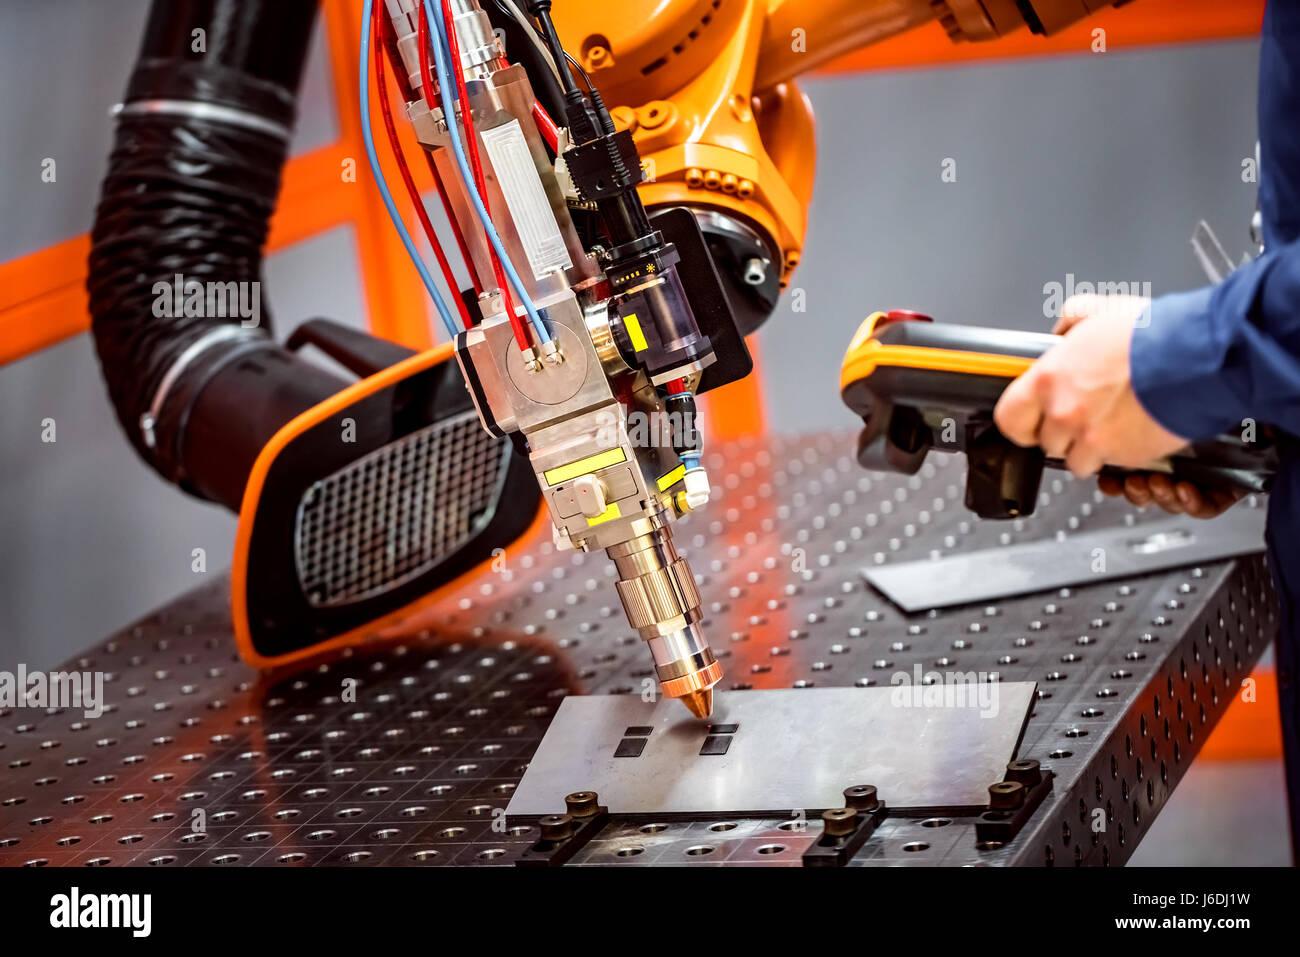 Fibre laser robotic remote cutting system. CNC Laser plasma cutting of metal, modern industrial technology. - Stock Image